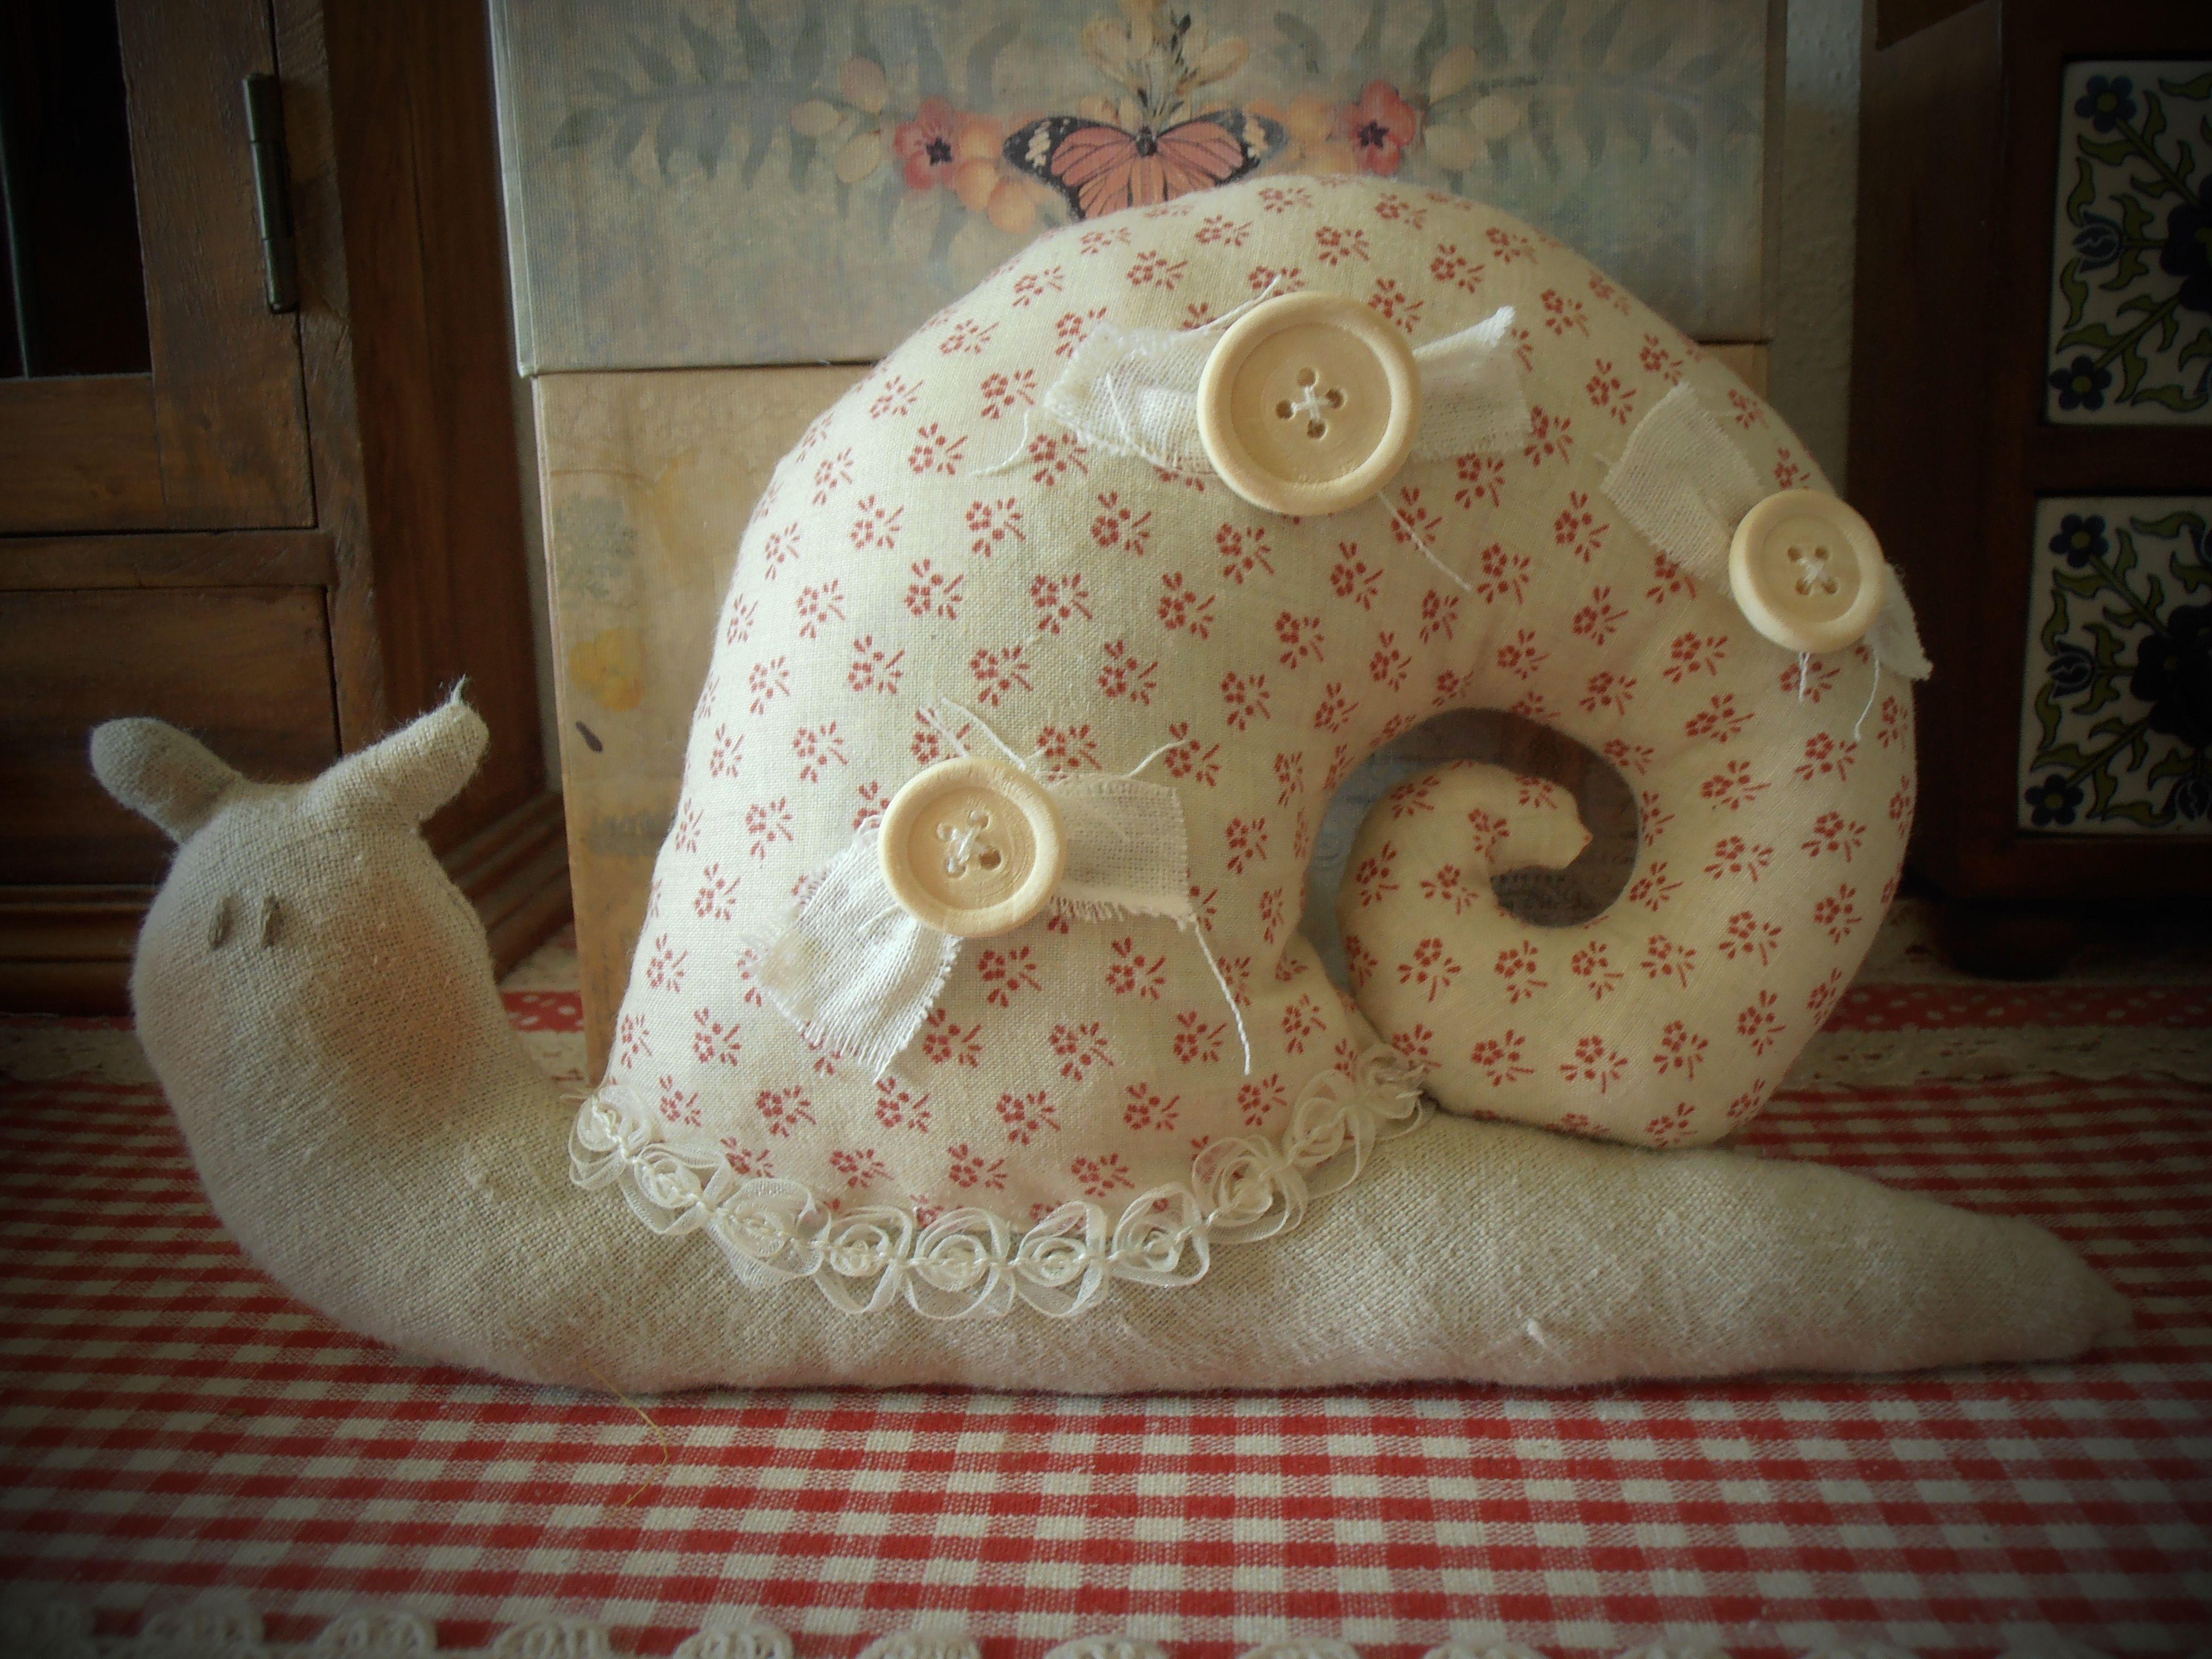 Tilda's snail with lavander Lumaca Tilda con lavanda